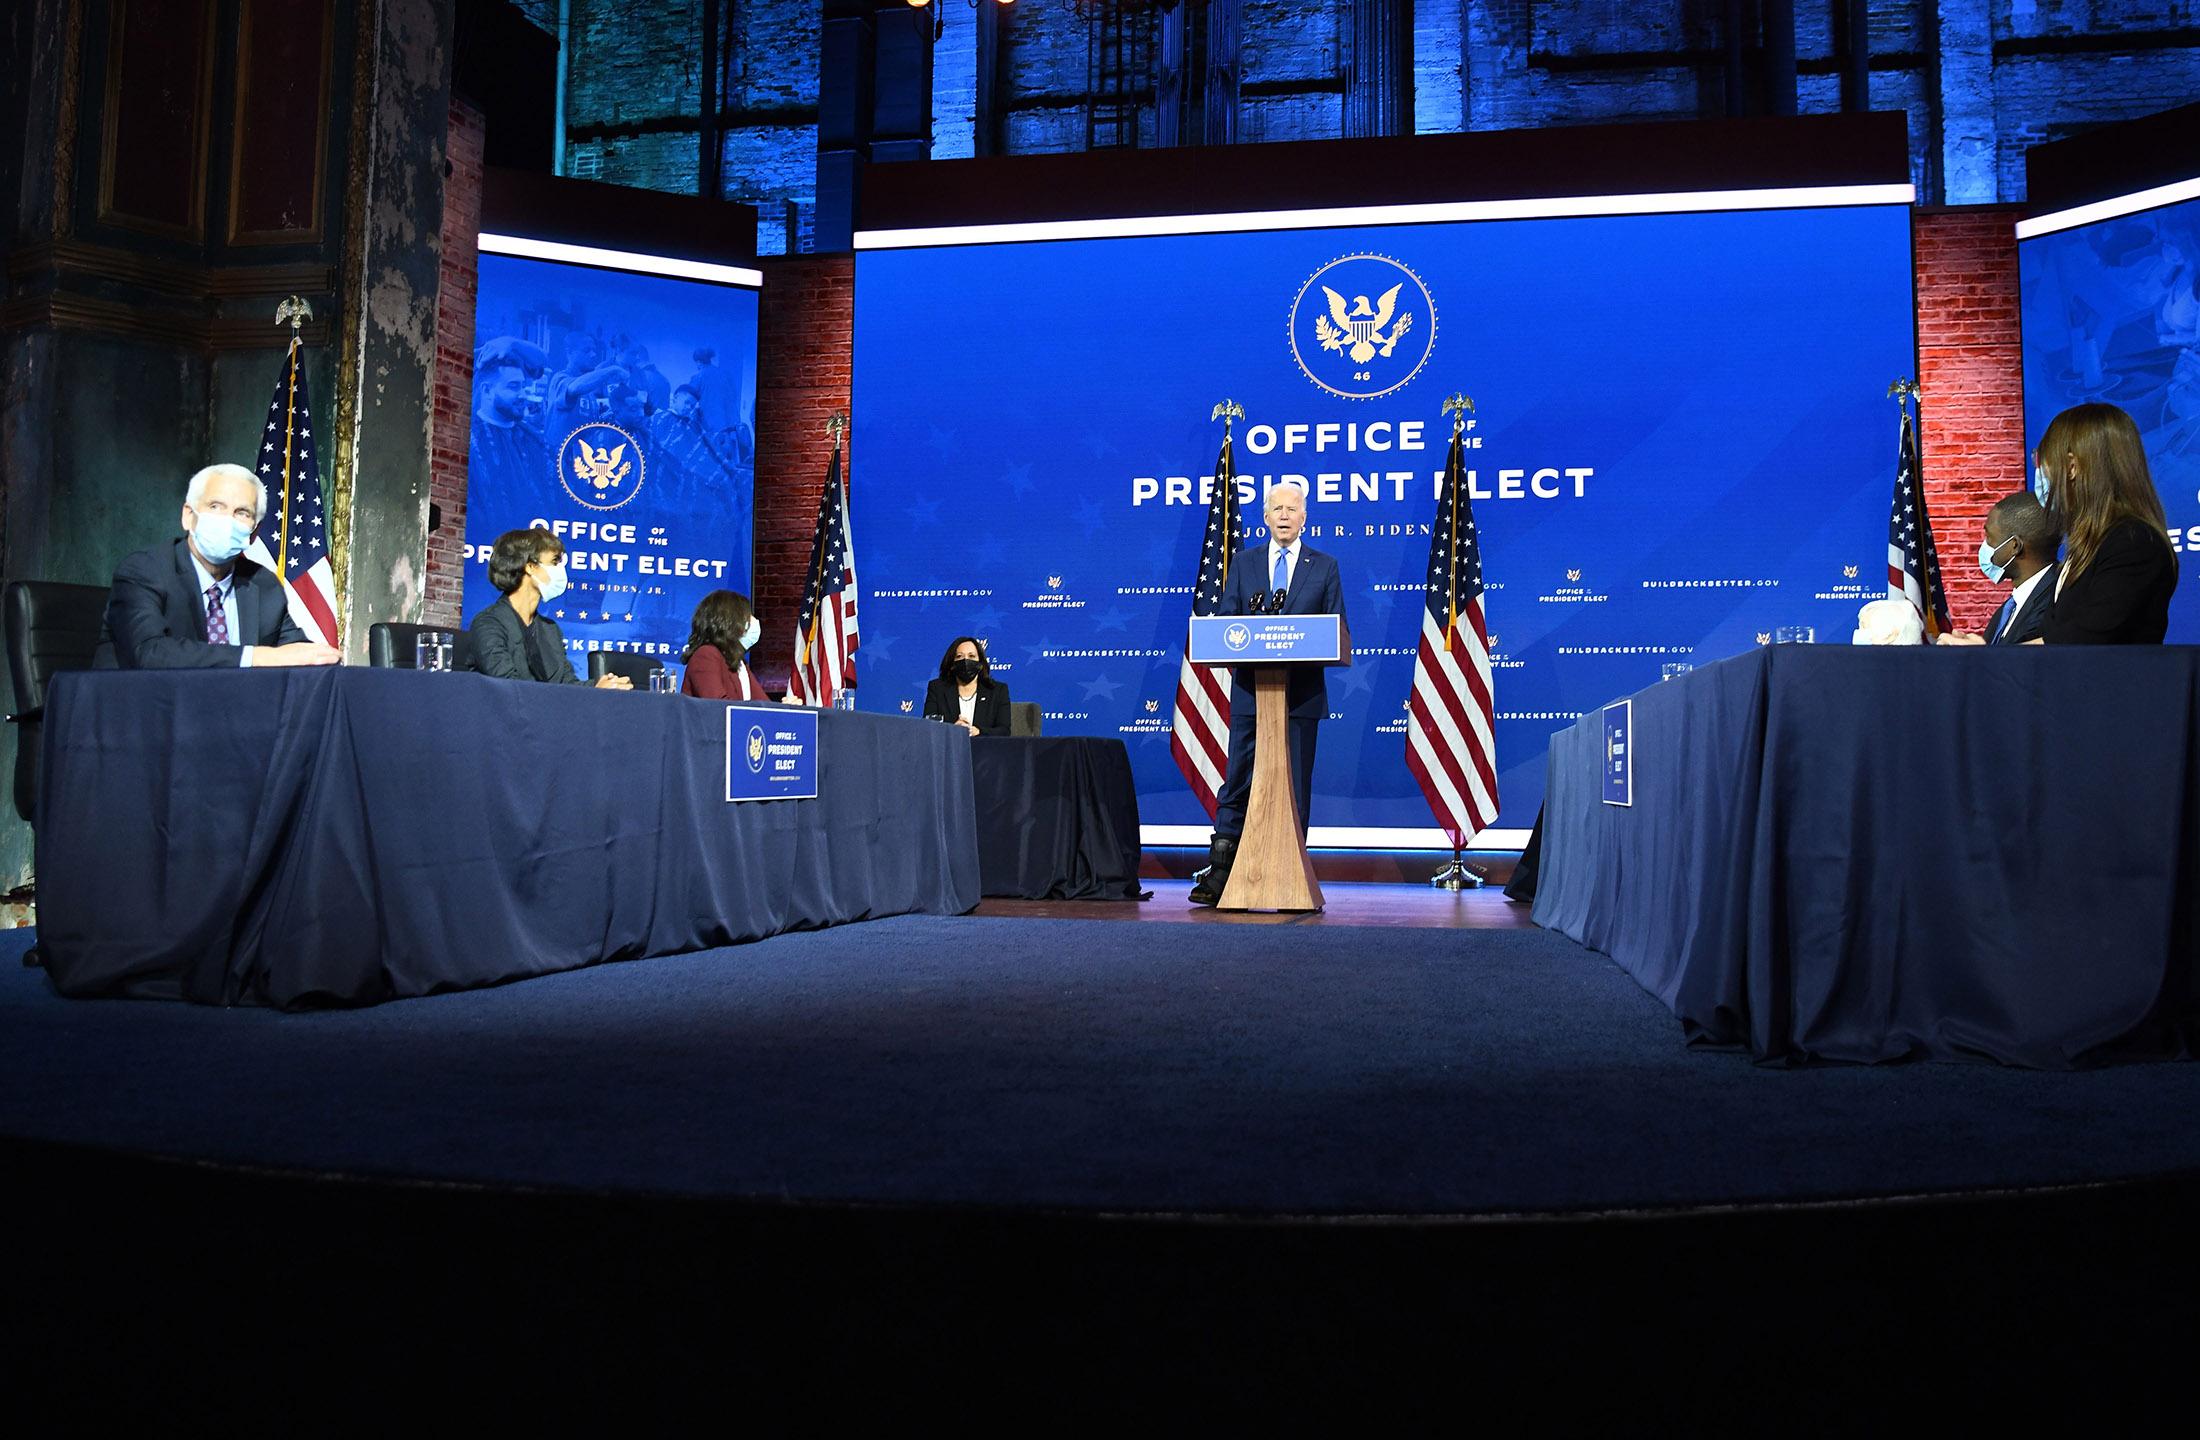 U.S. President-elect Joe Biden announces his economic team at The Queen Theater in Wilmington, Delaware, on December 1, 2020.